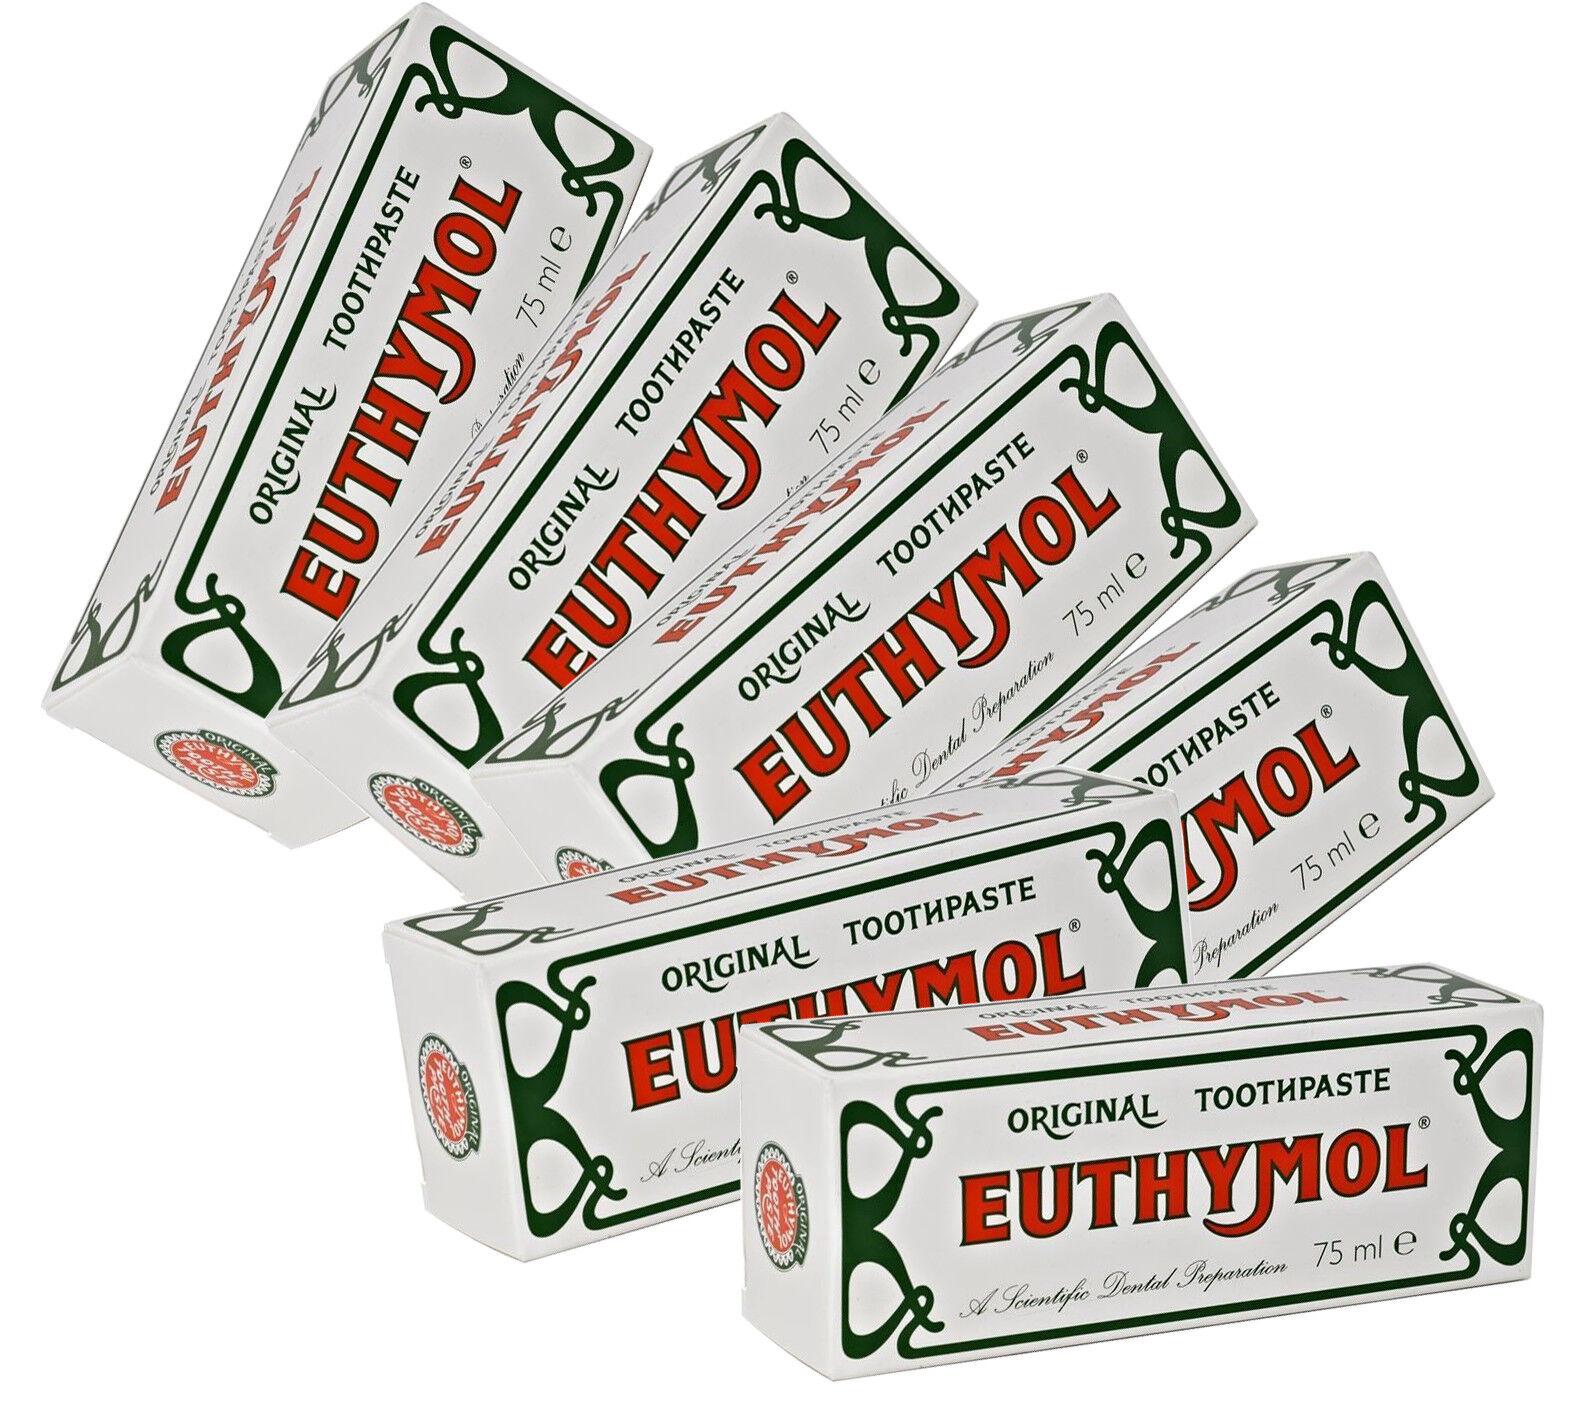 euthymol original toothpaste waitrose amp partners - HD1584×1419